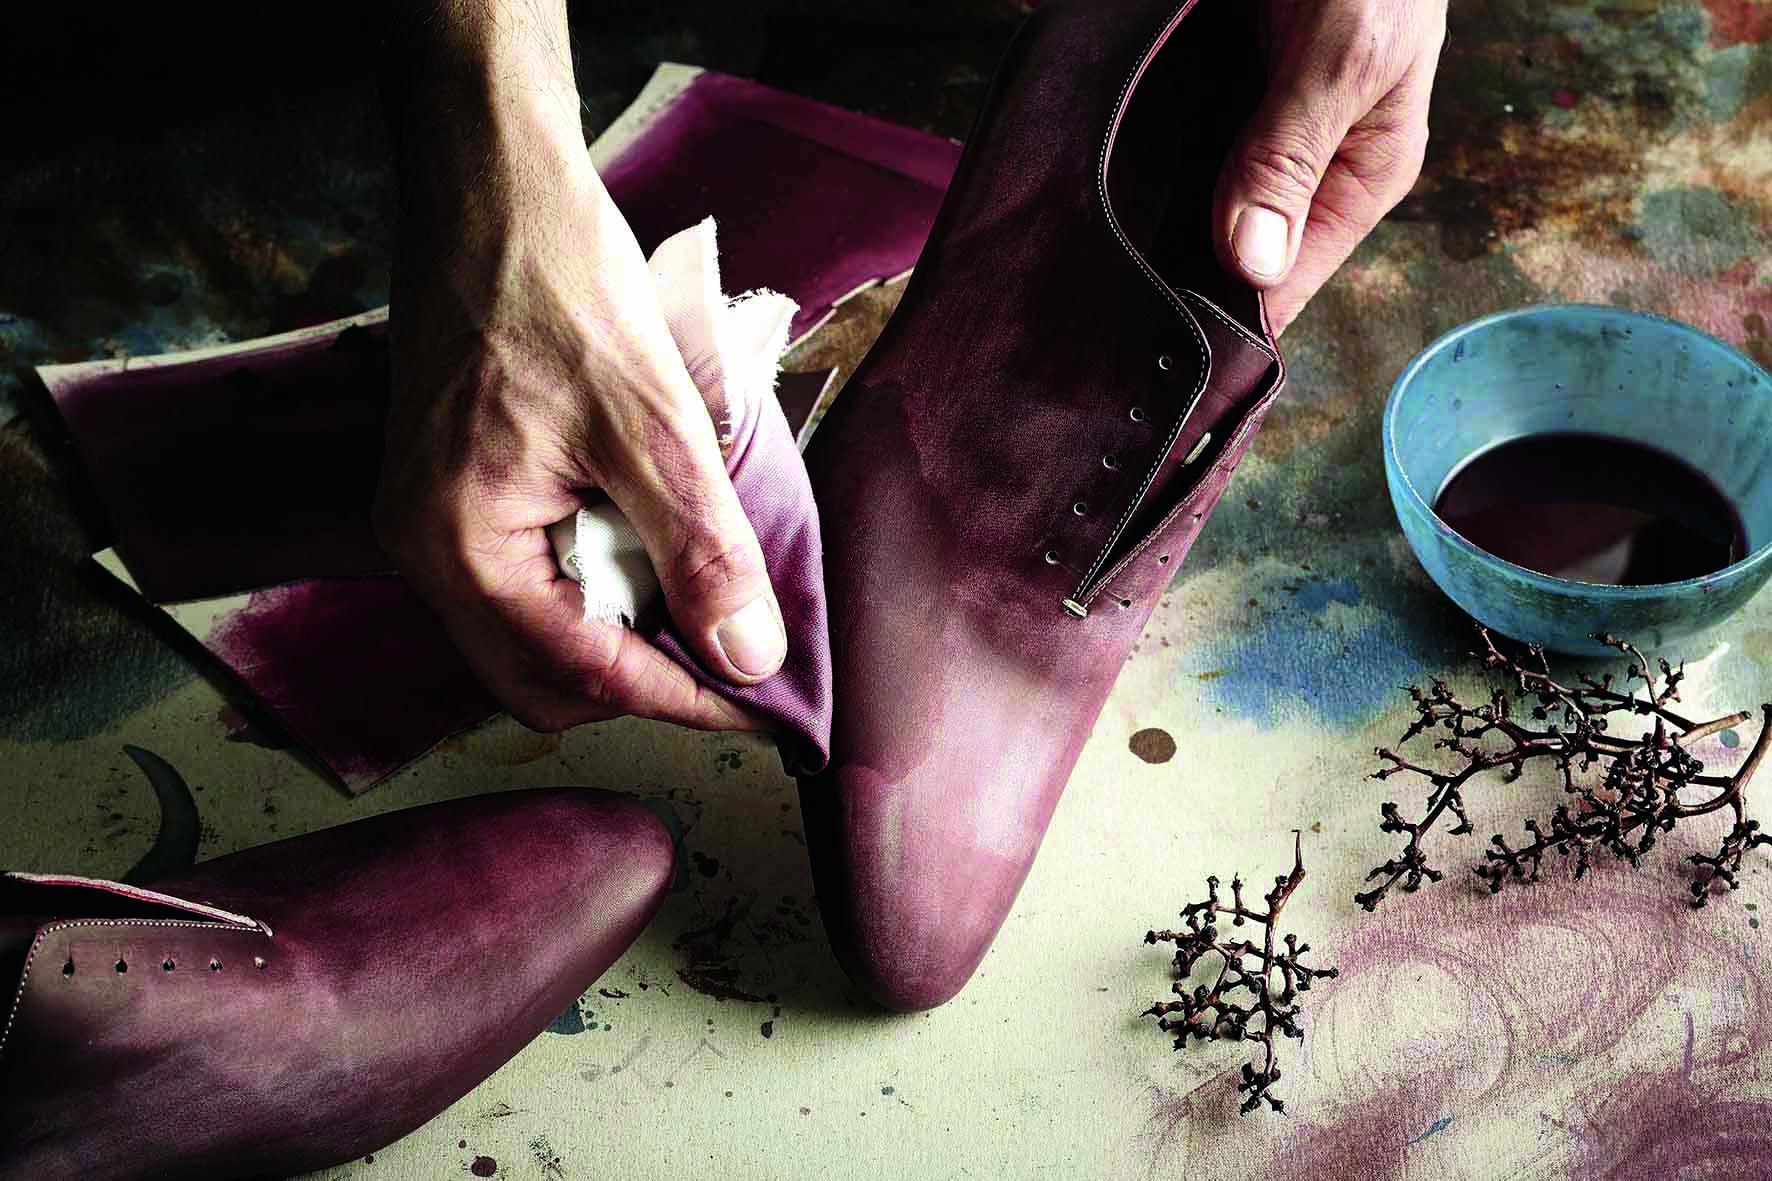 detailing ccda6 feee7 I piani di crescita di Moreschi, il brand di calzature amato ...